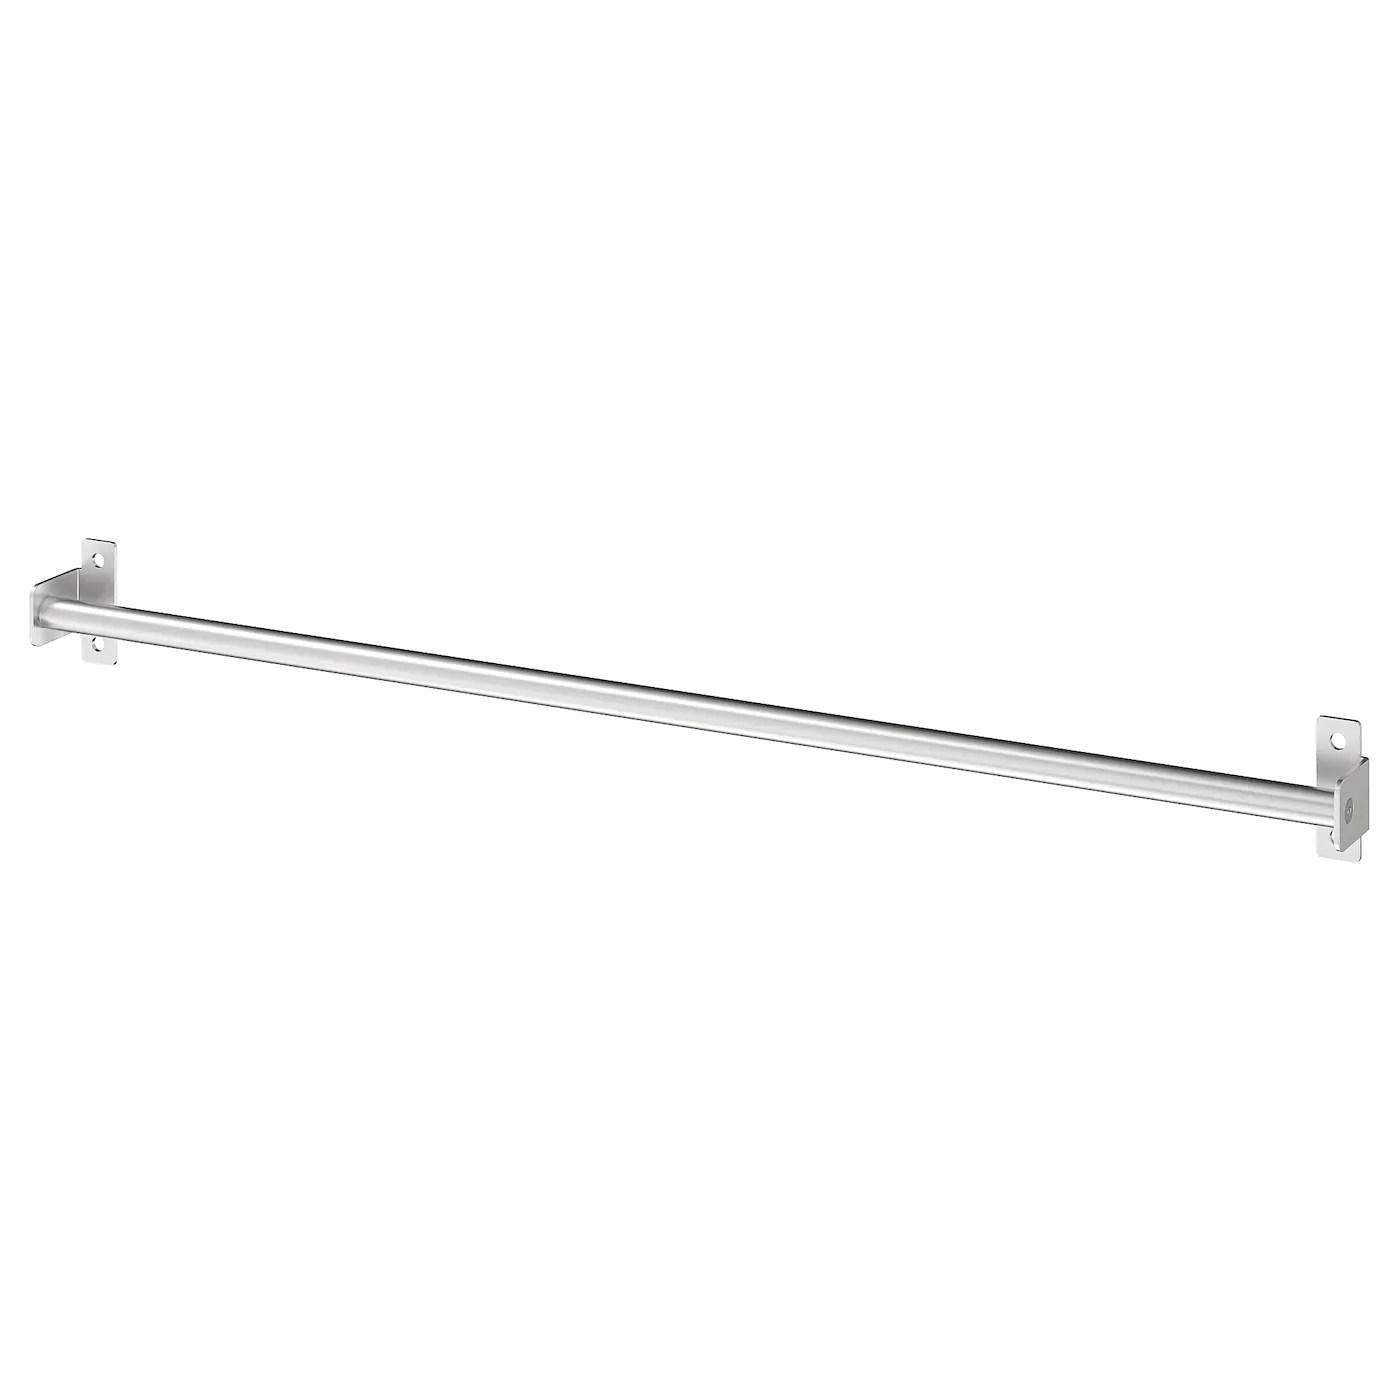 kungsfors barre support acier inox 22 56 cm